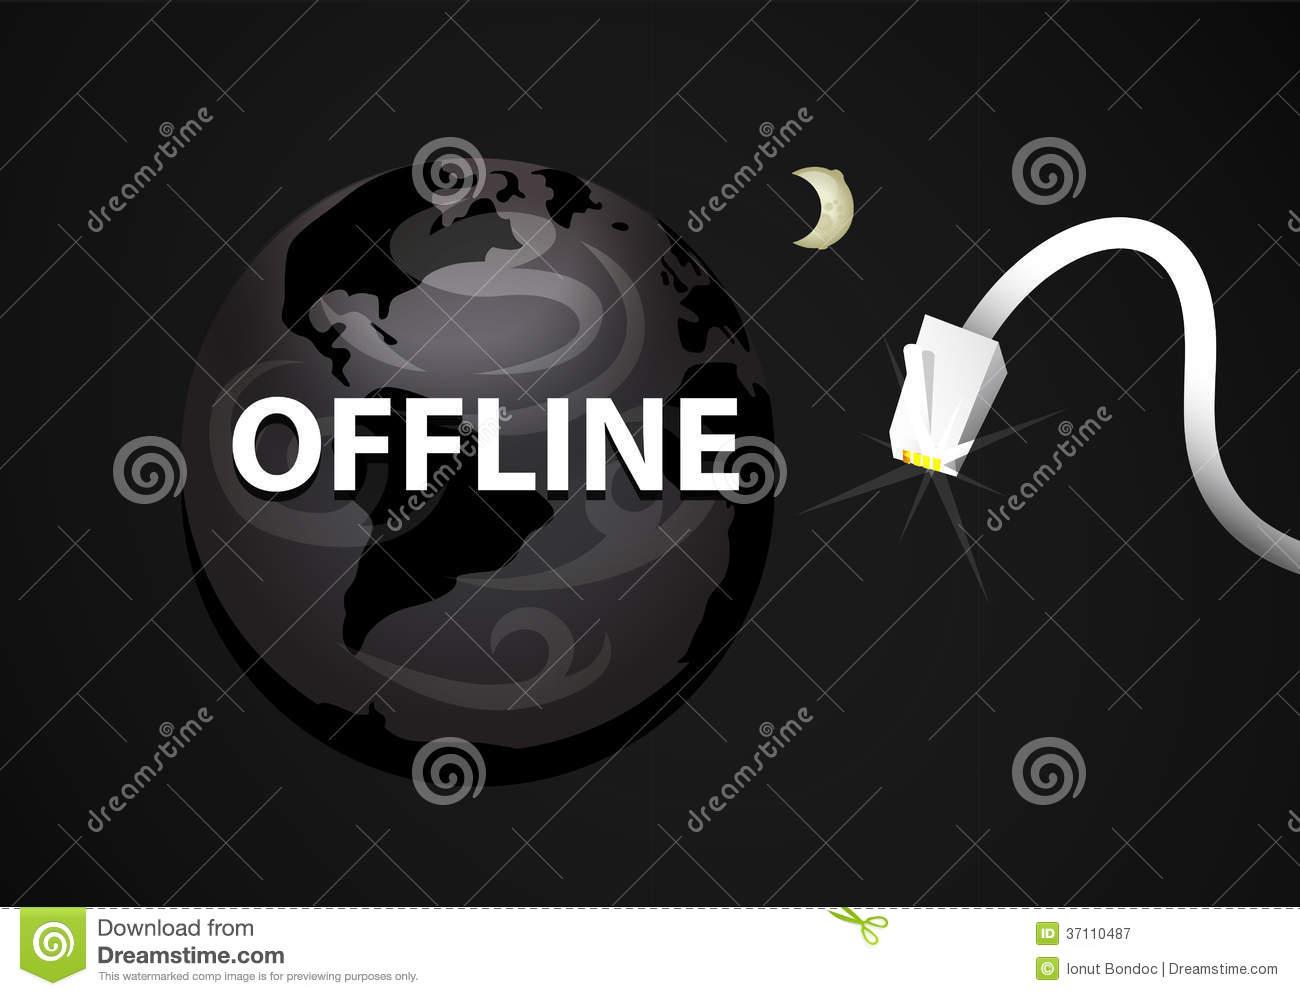 Offline Clip Art.